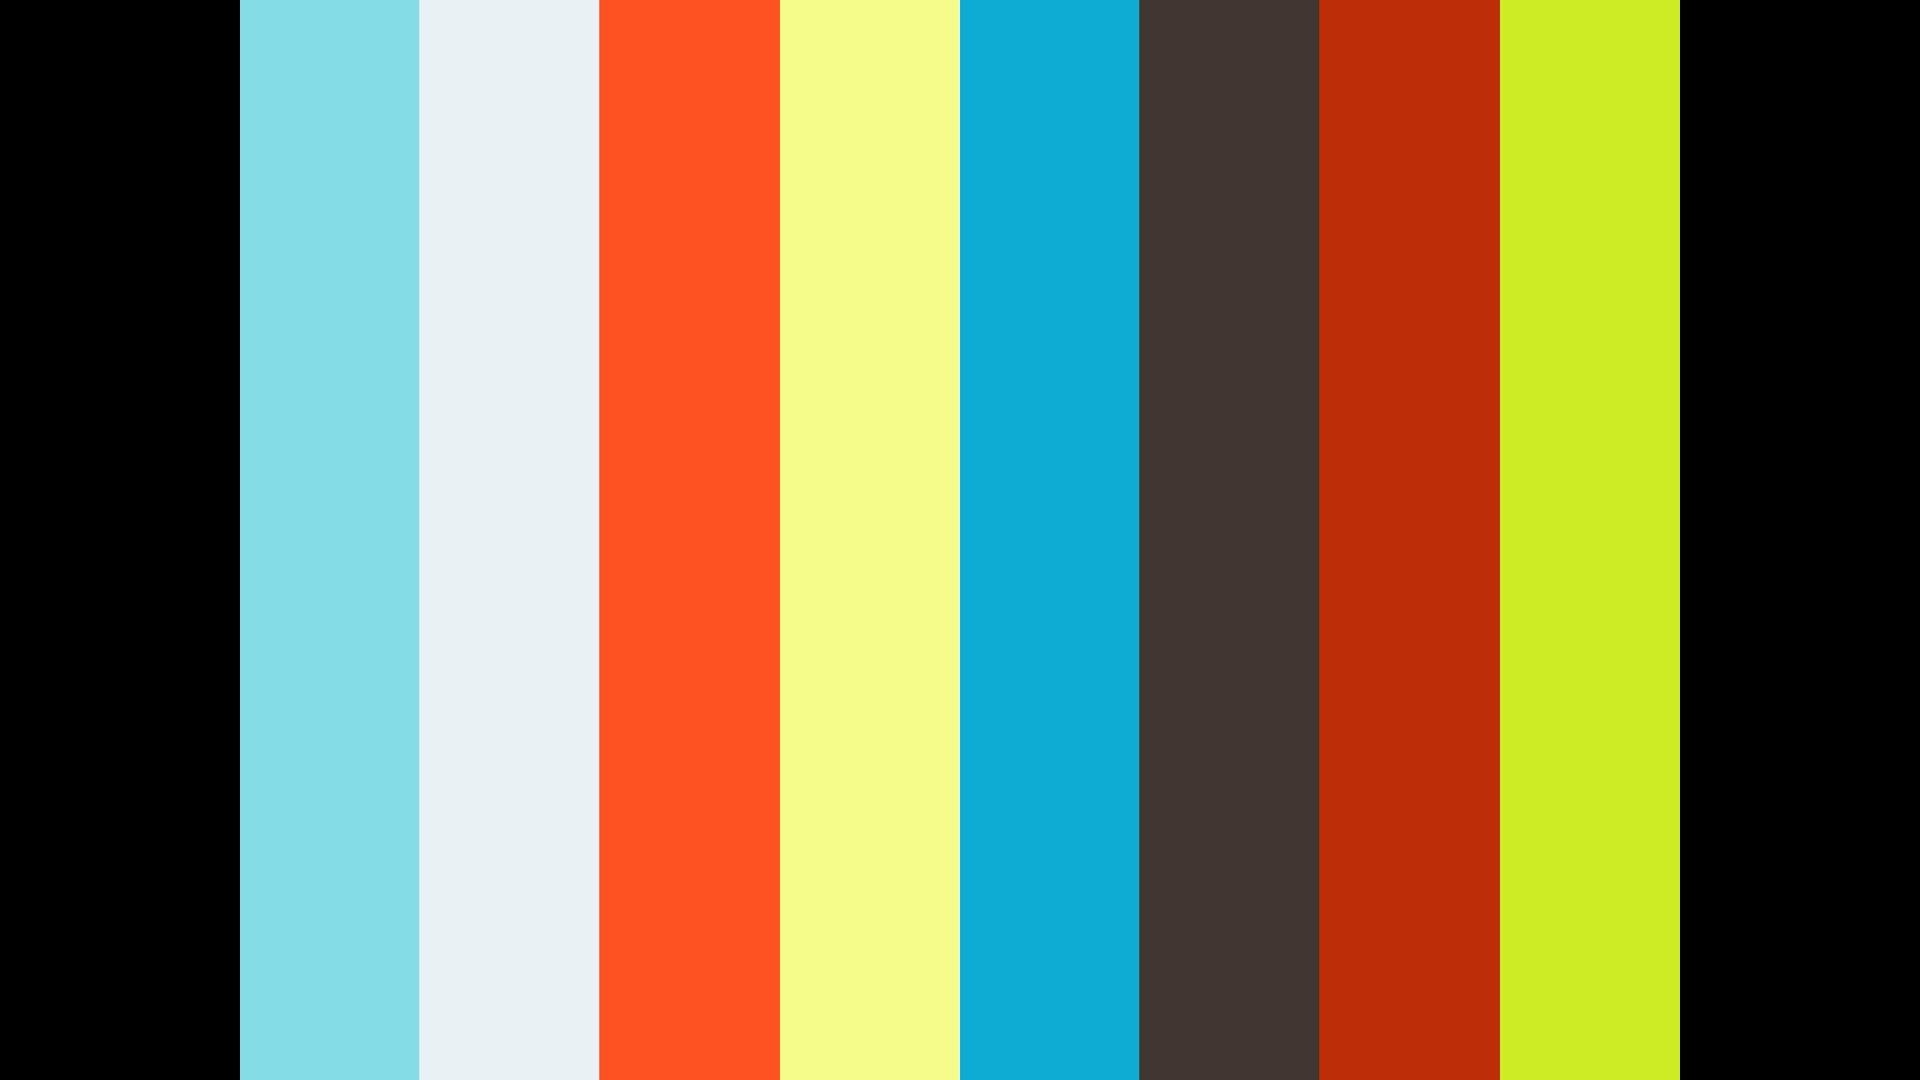 2021_05_17 - Brad - SCOOP 1k Series Saver Part 3